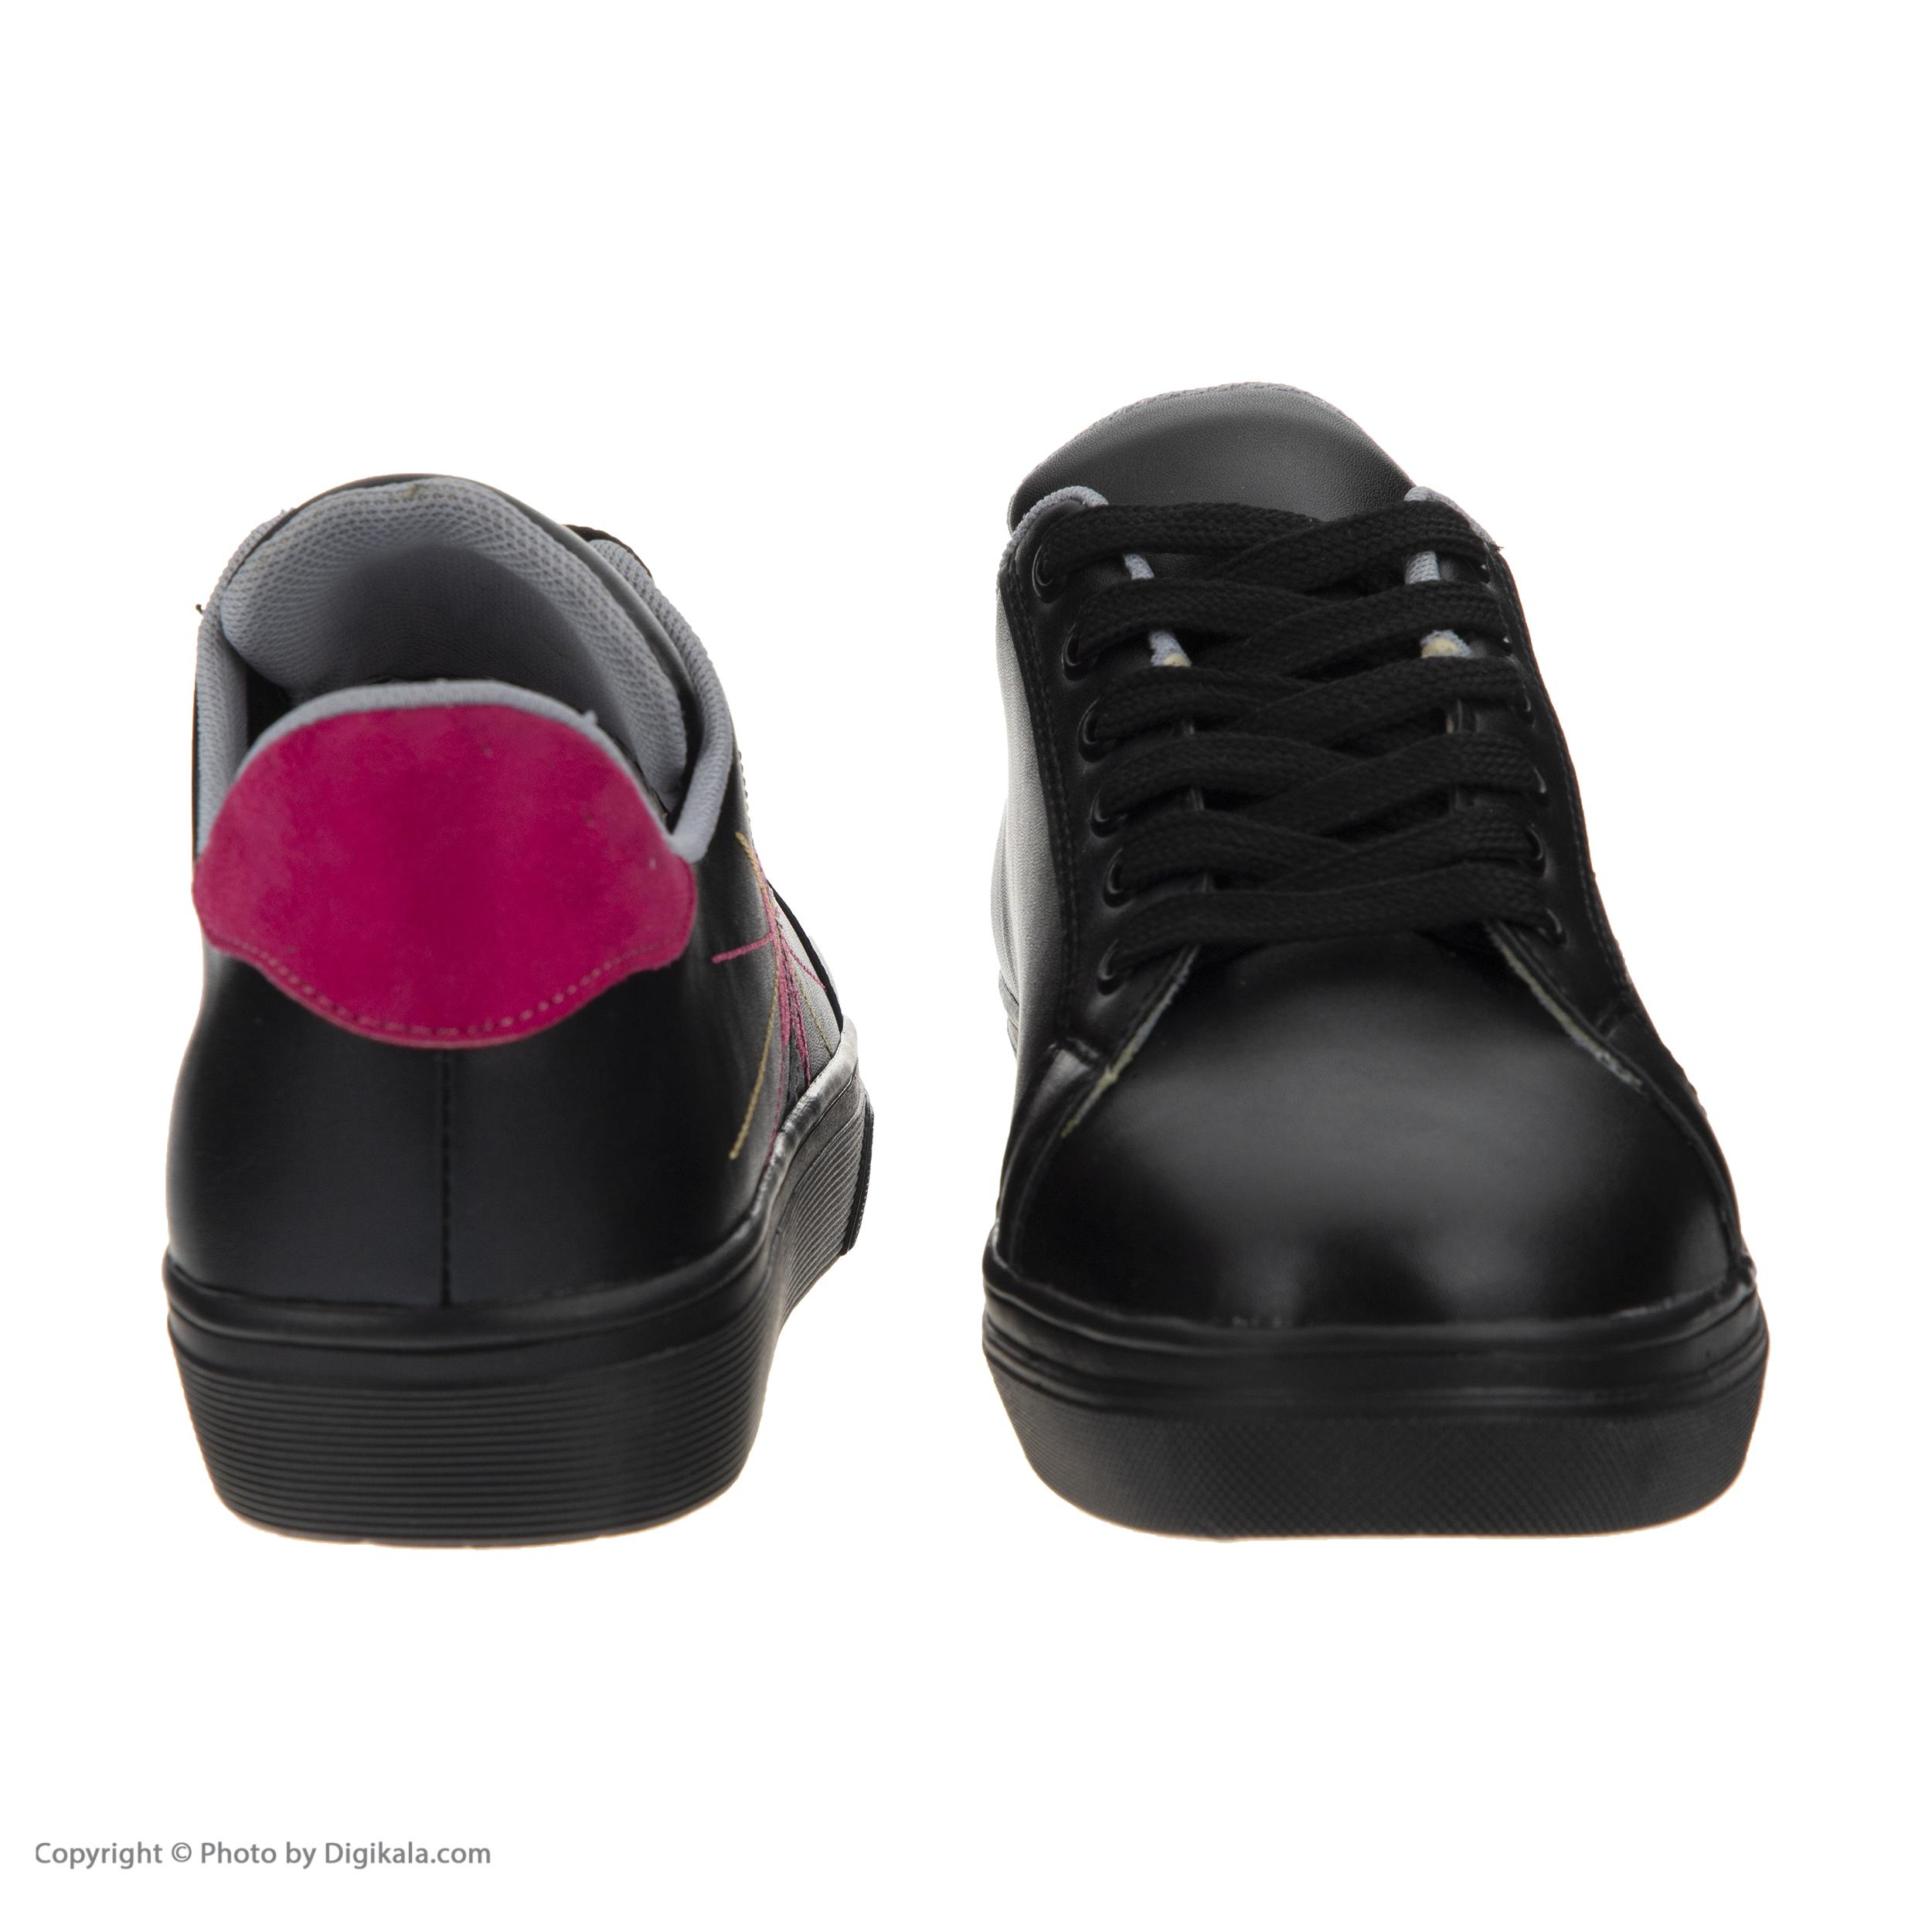 کفش روزمره زنانه مدل 4023 -  - 7